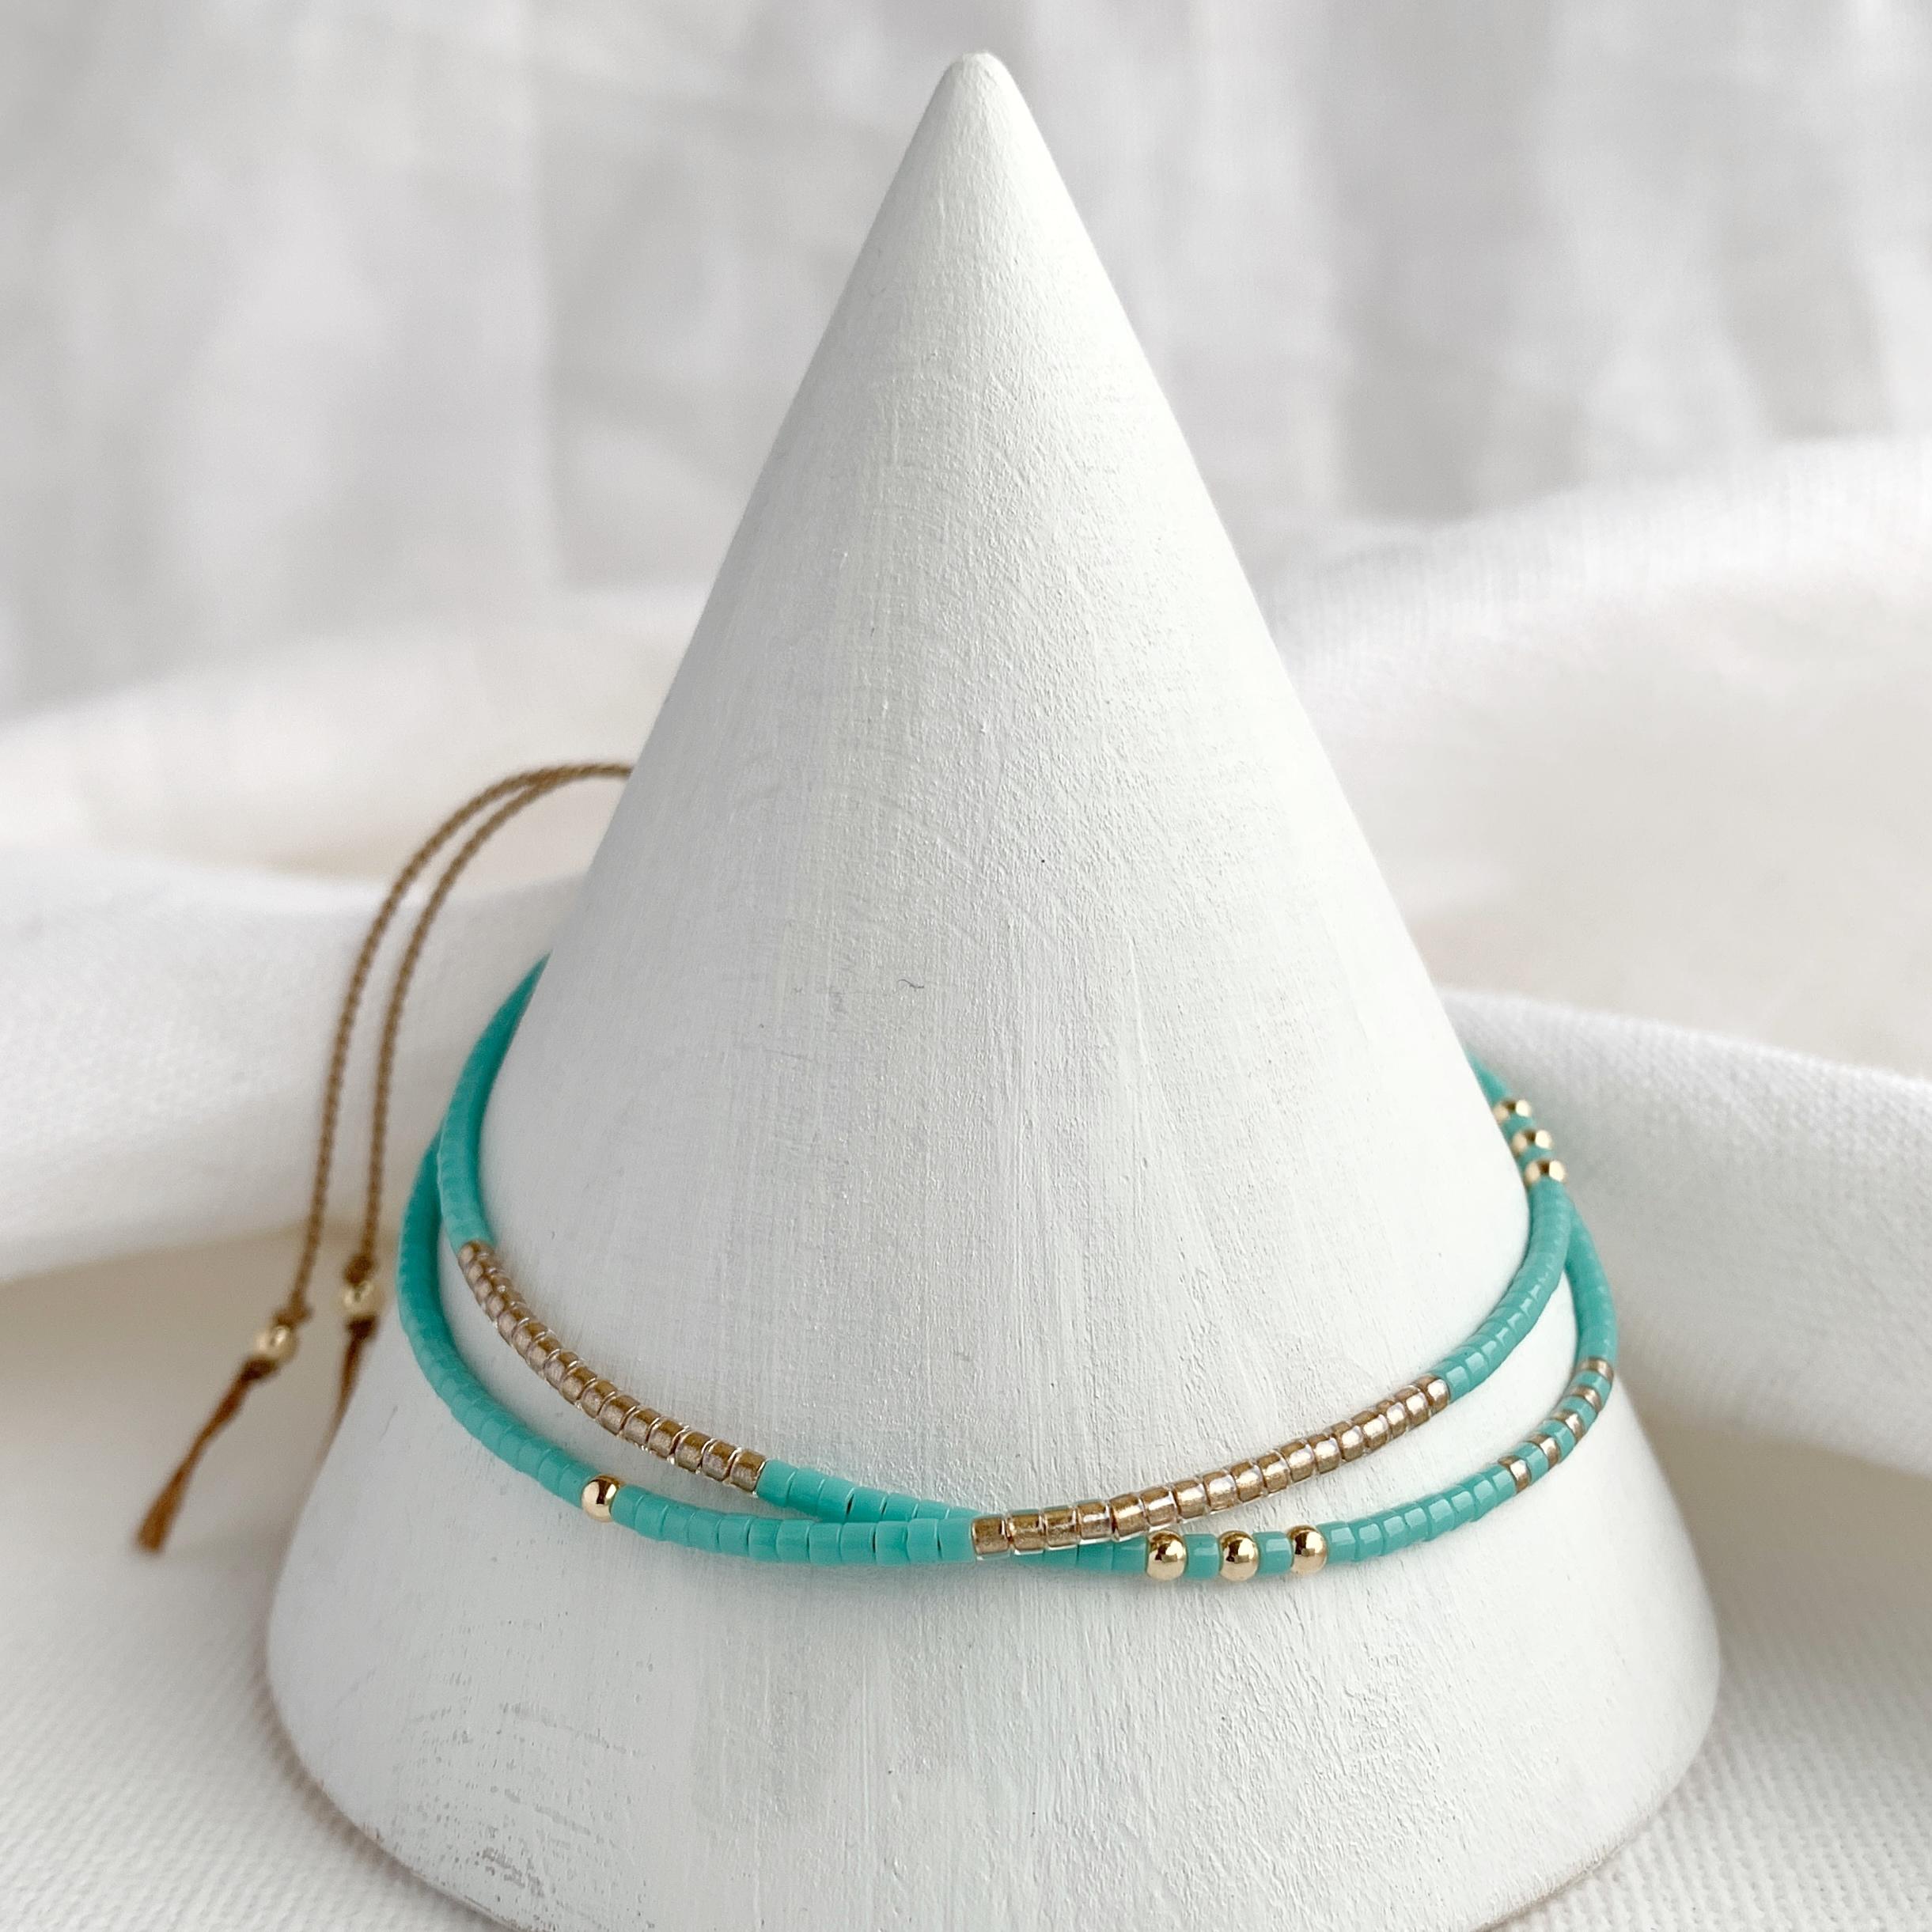 Hardy to Hudson, Turquoise Gold Double Wrap Bracelet